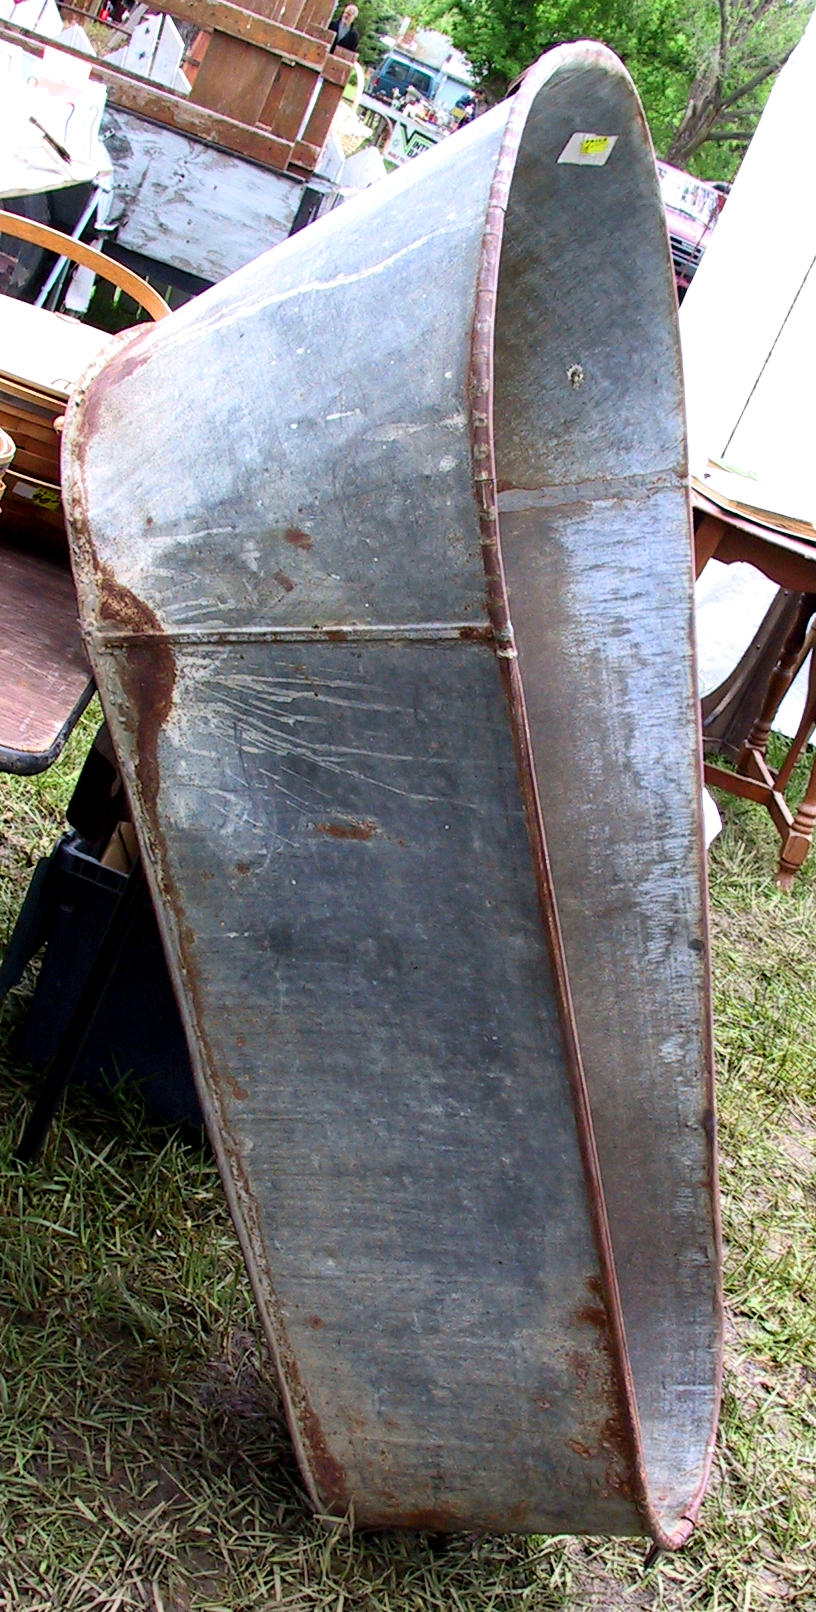 ... Vintage Metal Bathtub 3 By Falln Stock